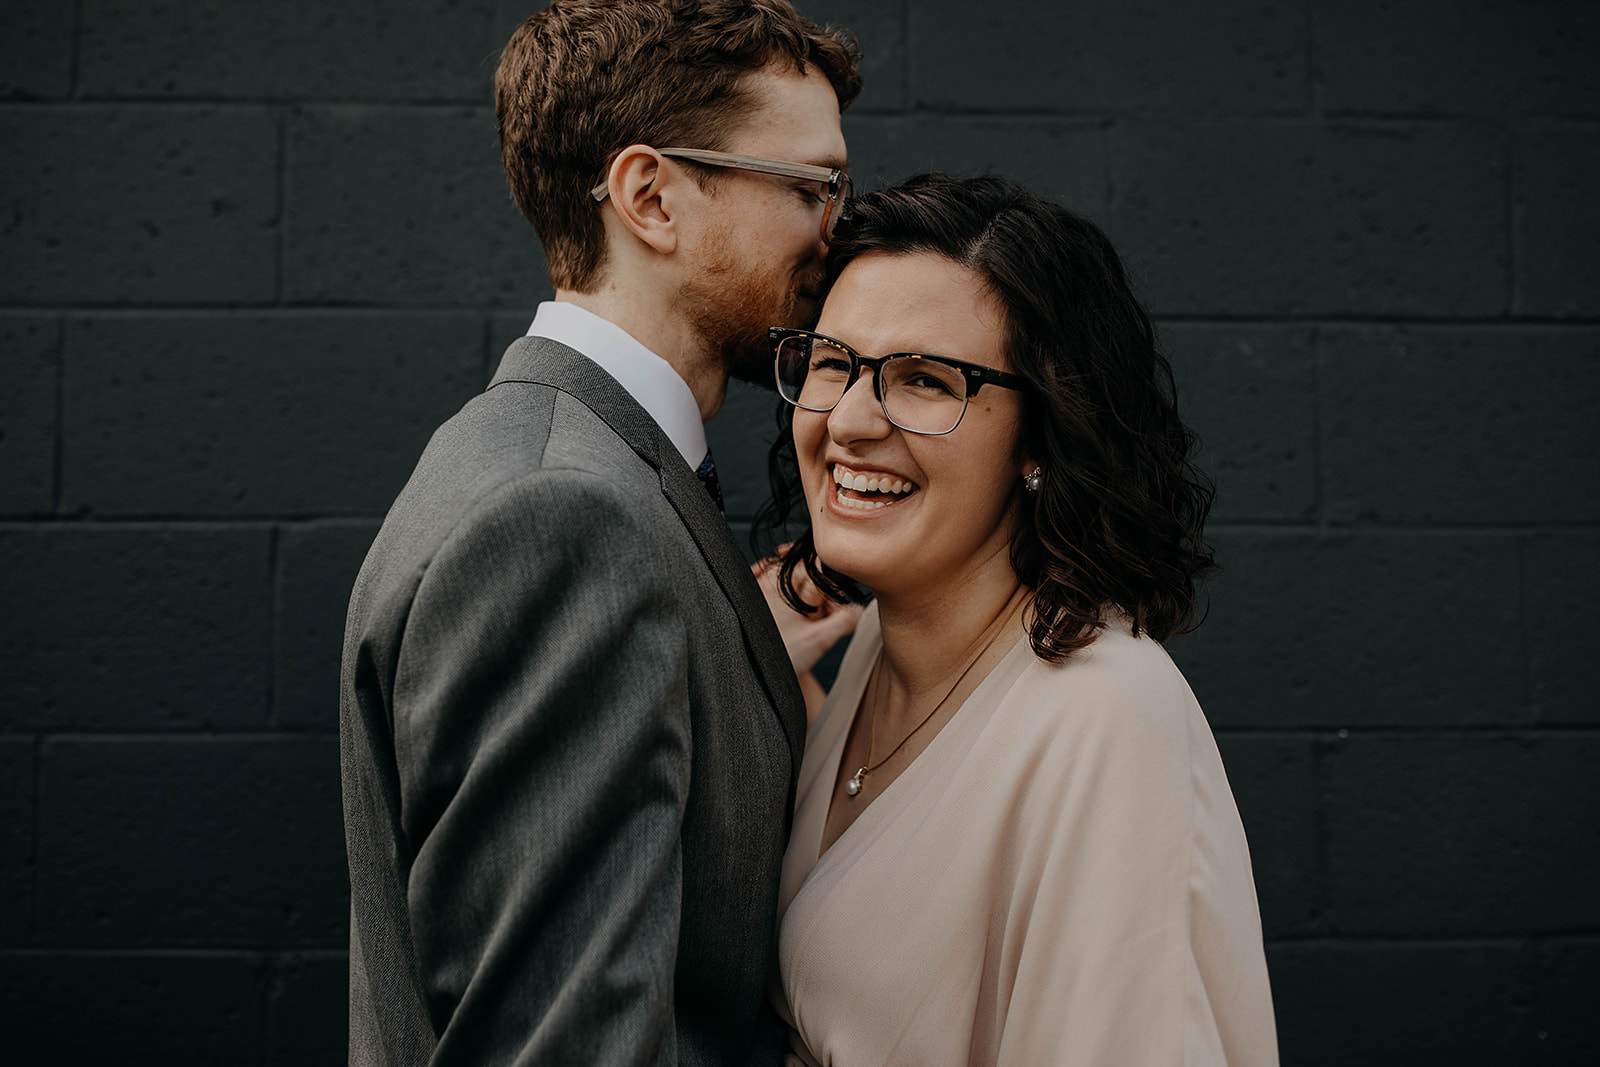 Gahanna Sanctuary Quirky Wedding Isabel and Luke Grace E Jones photography wedding photography144.jpg